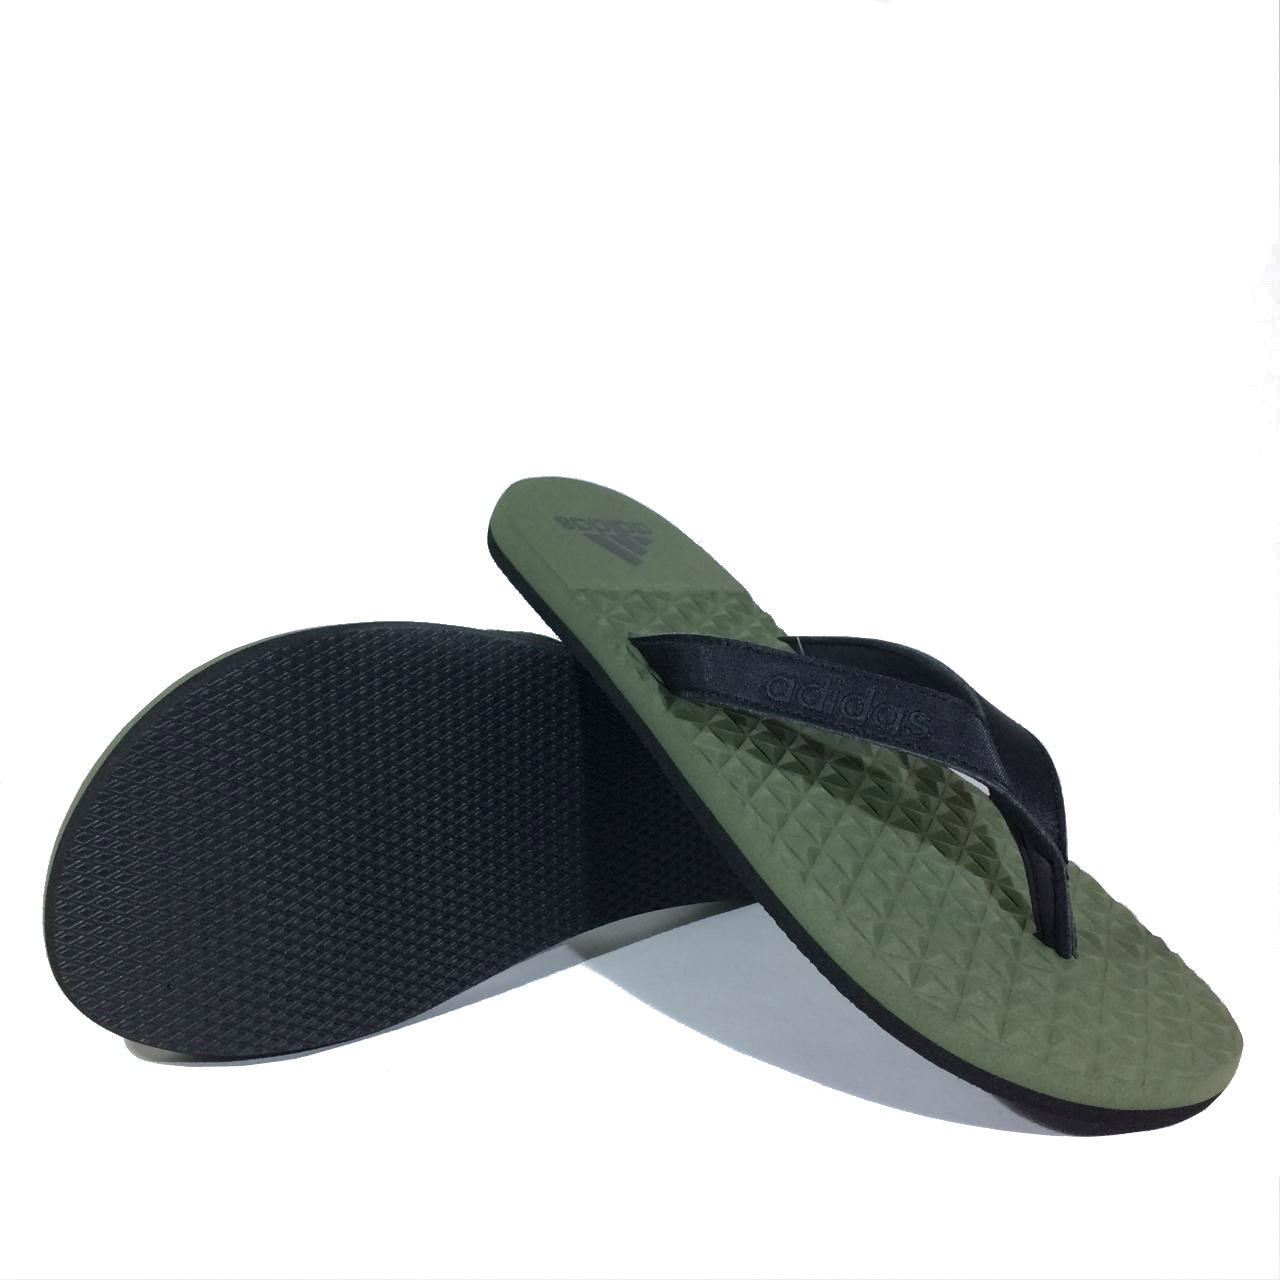 Eezay Sandalias Flop Adidas Flip B43554 A5j4R3L